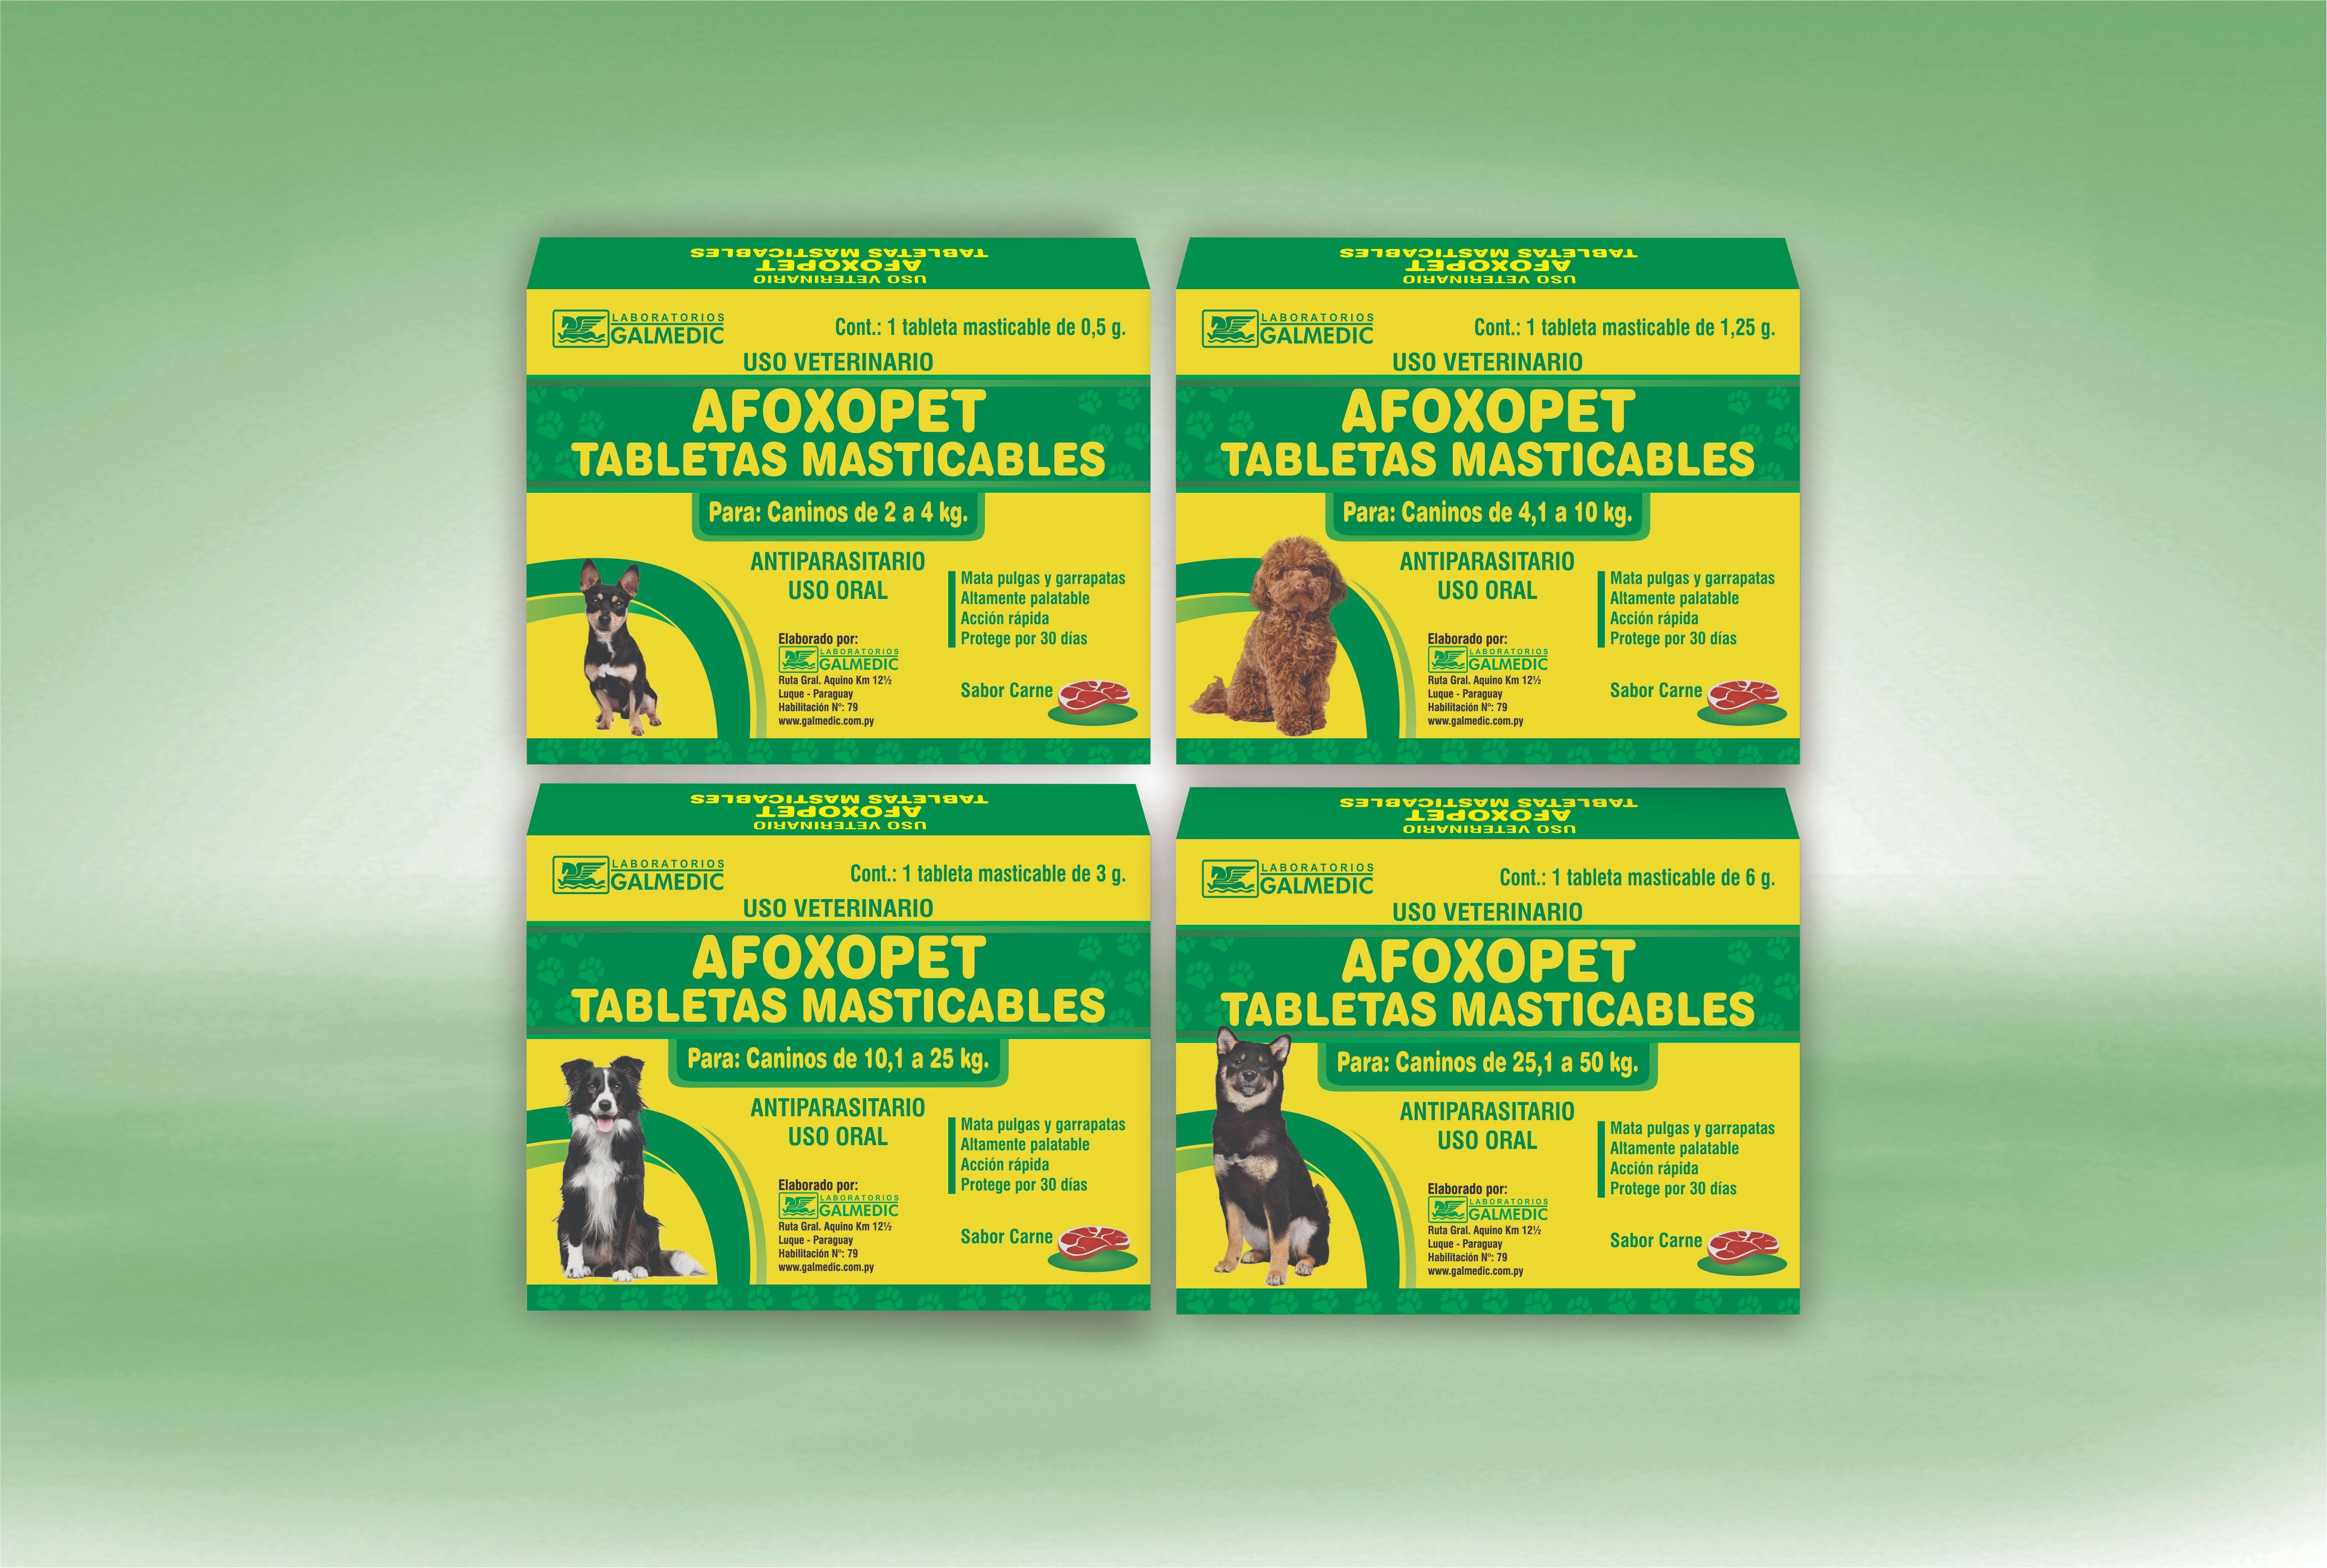 AFOXOPET